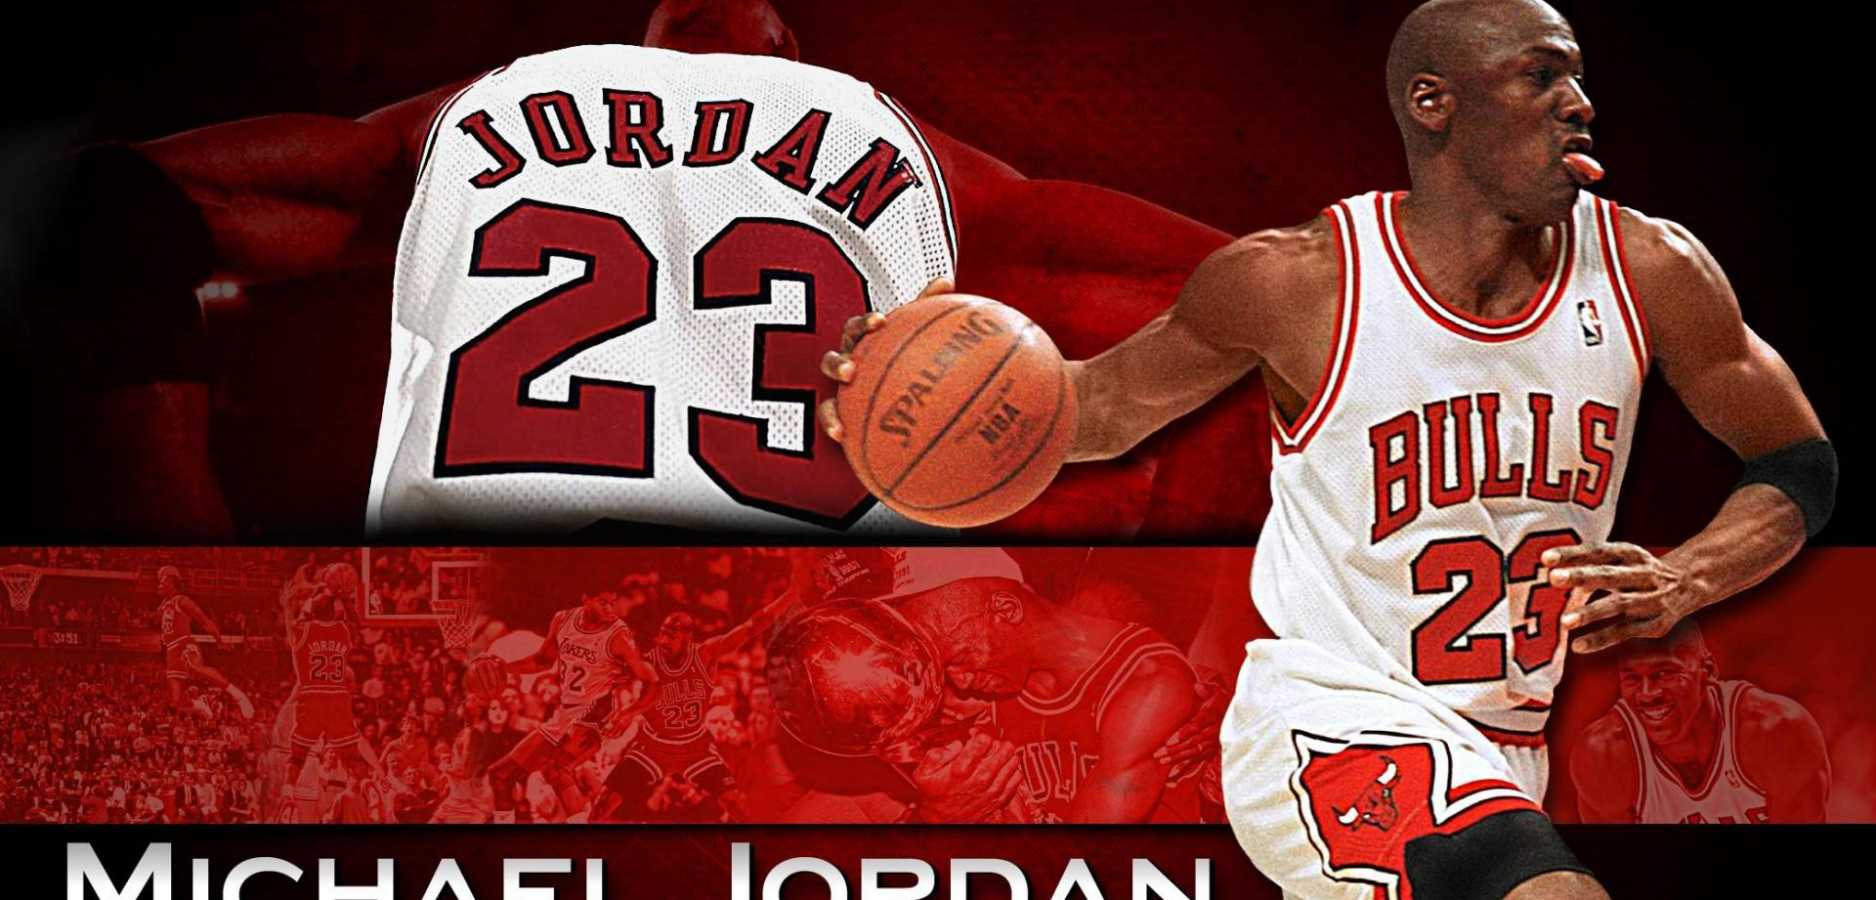 Michael-Jordan-Chicago-Bulls copy 2